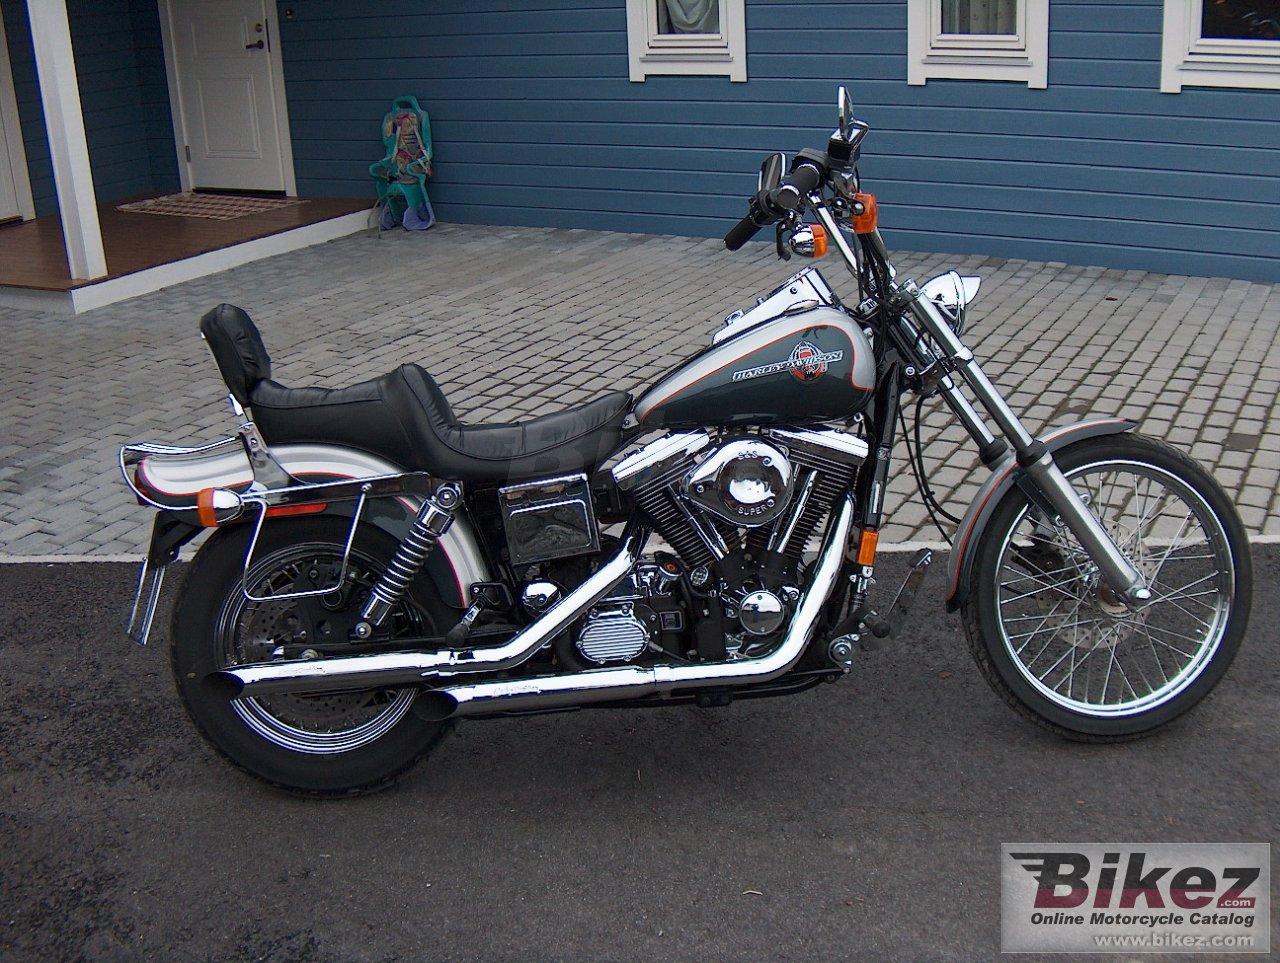 Harley Davidson Dyna Wide Glide Specifications